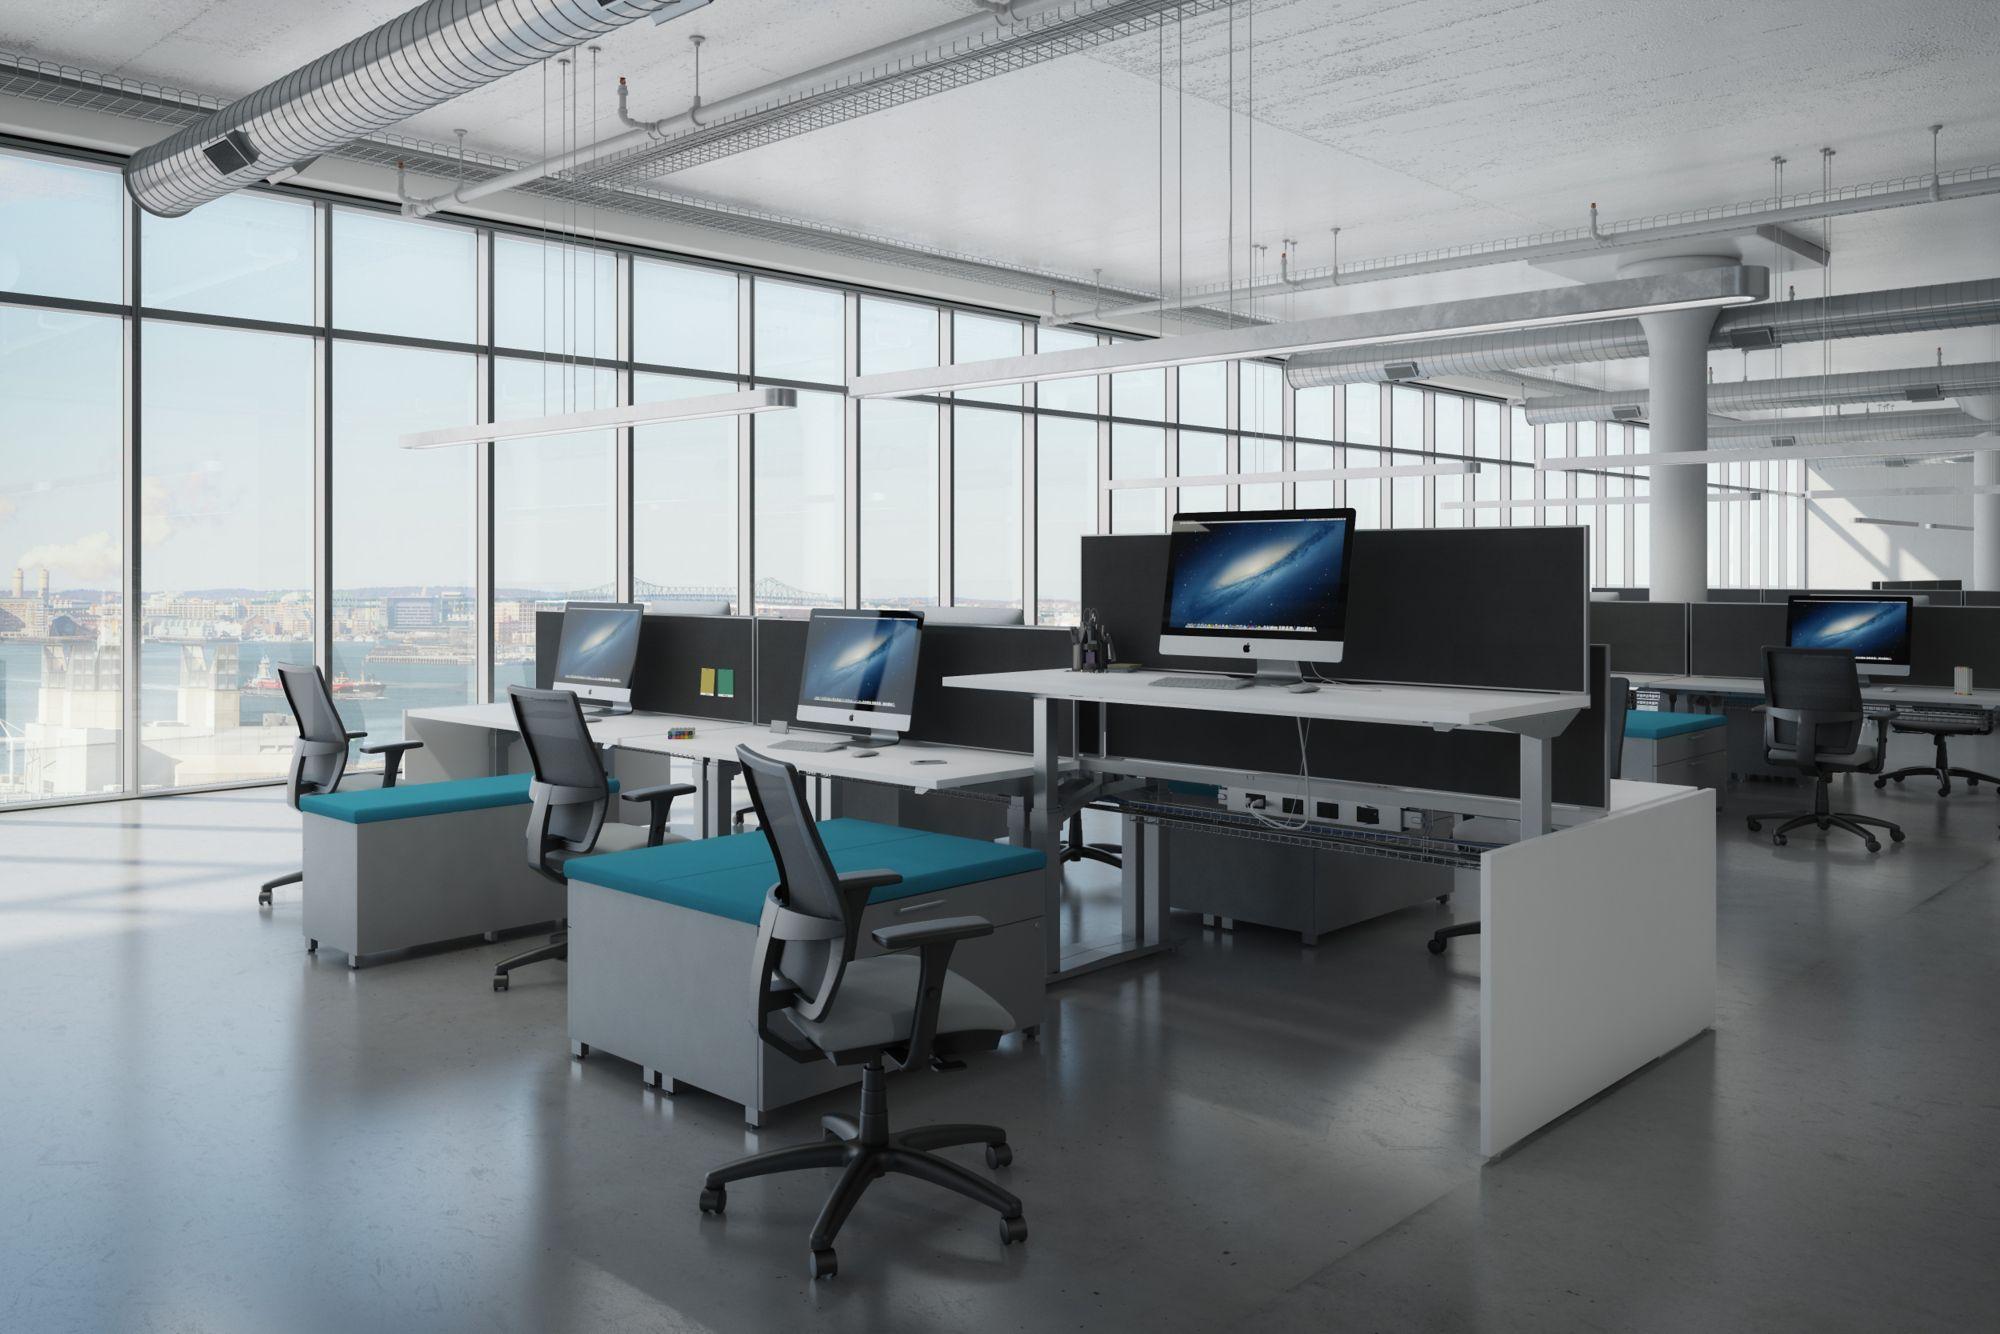 AIS Aloft Adjustable Height Sit/Stand Workstations